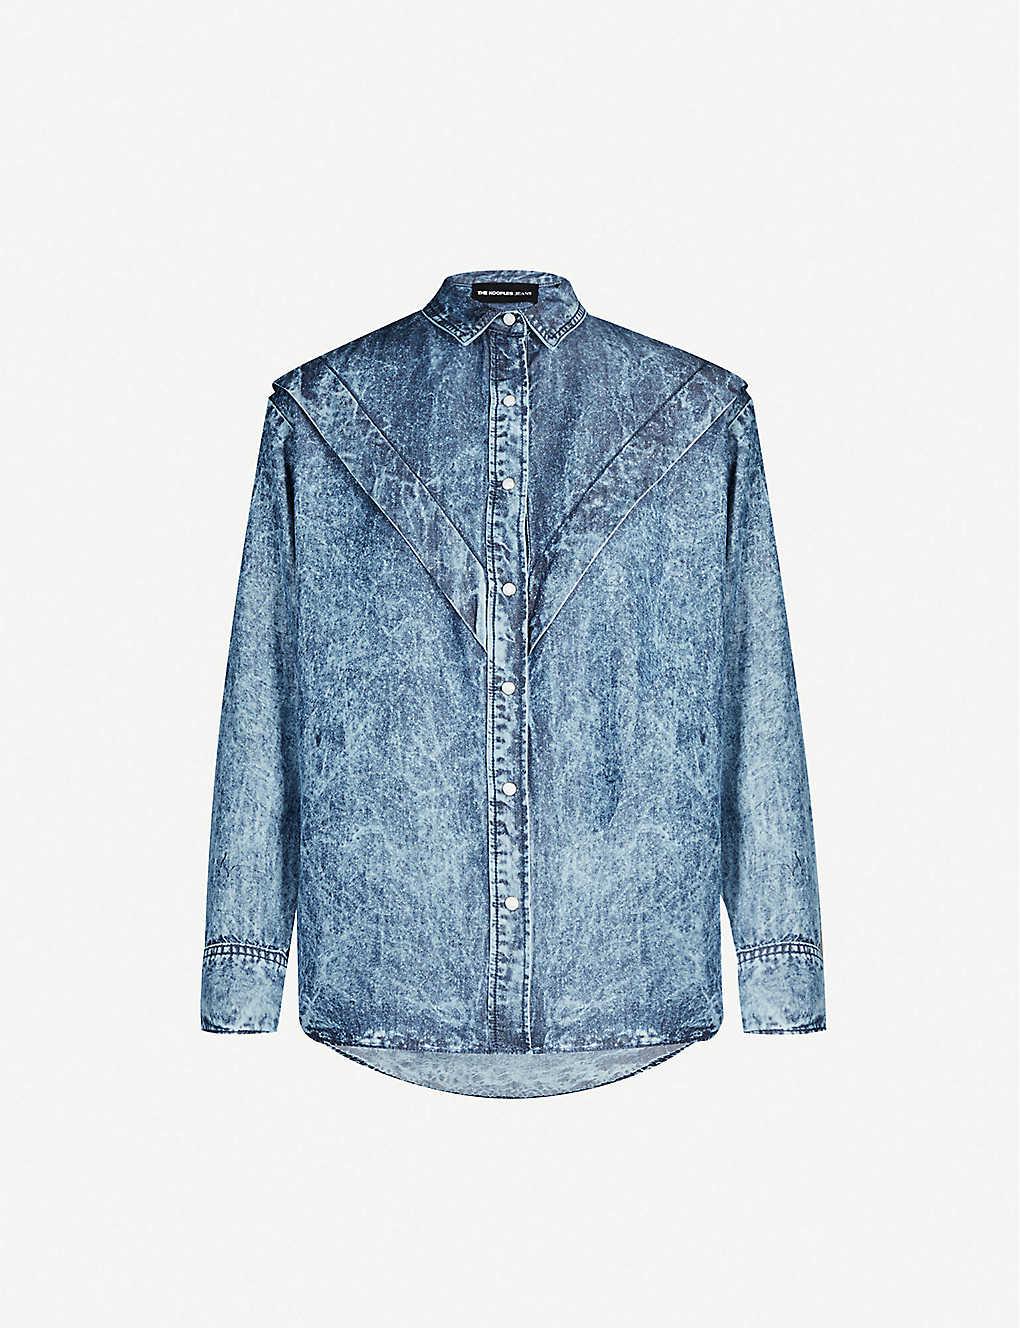 2e5a10b21c THE KOOPLES - Ruffled-trim acid-wash denim shirt | Selfridges.com